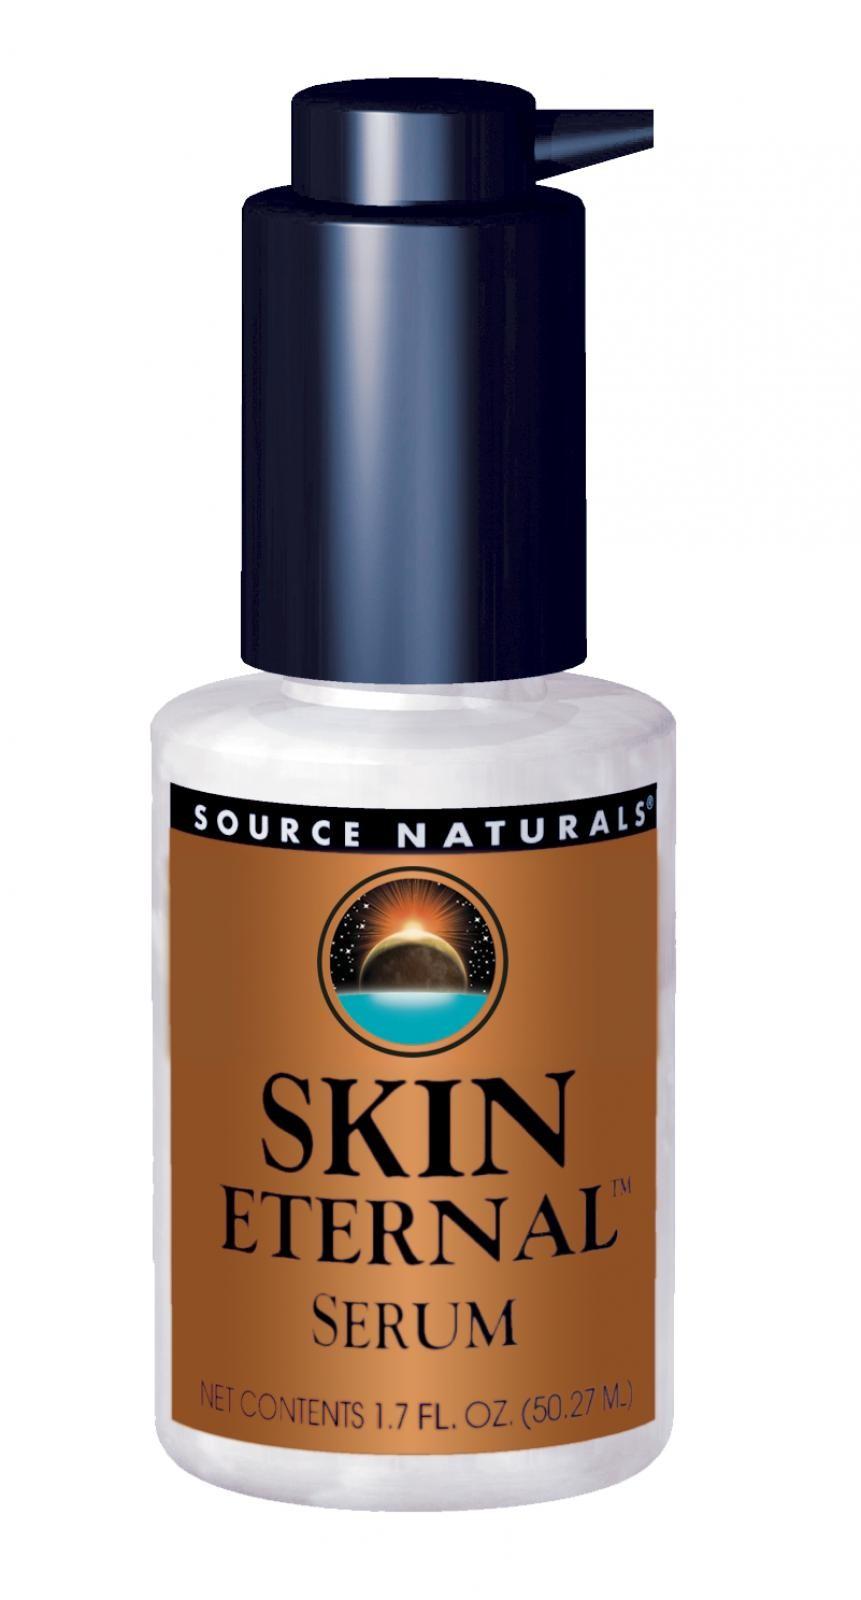 Source Naturals Skin Eternal Serum 1 7 Fl Oz Serum Walmart Com